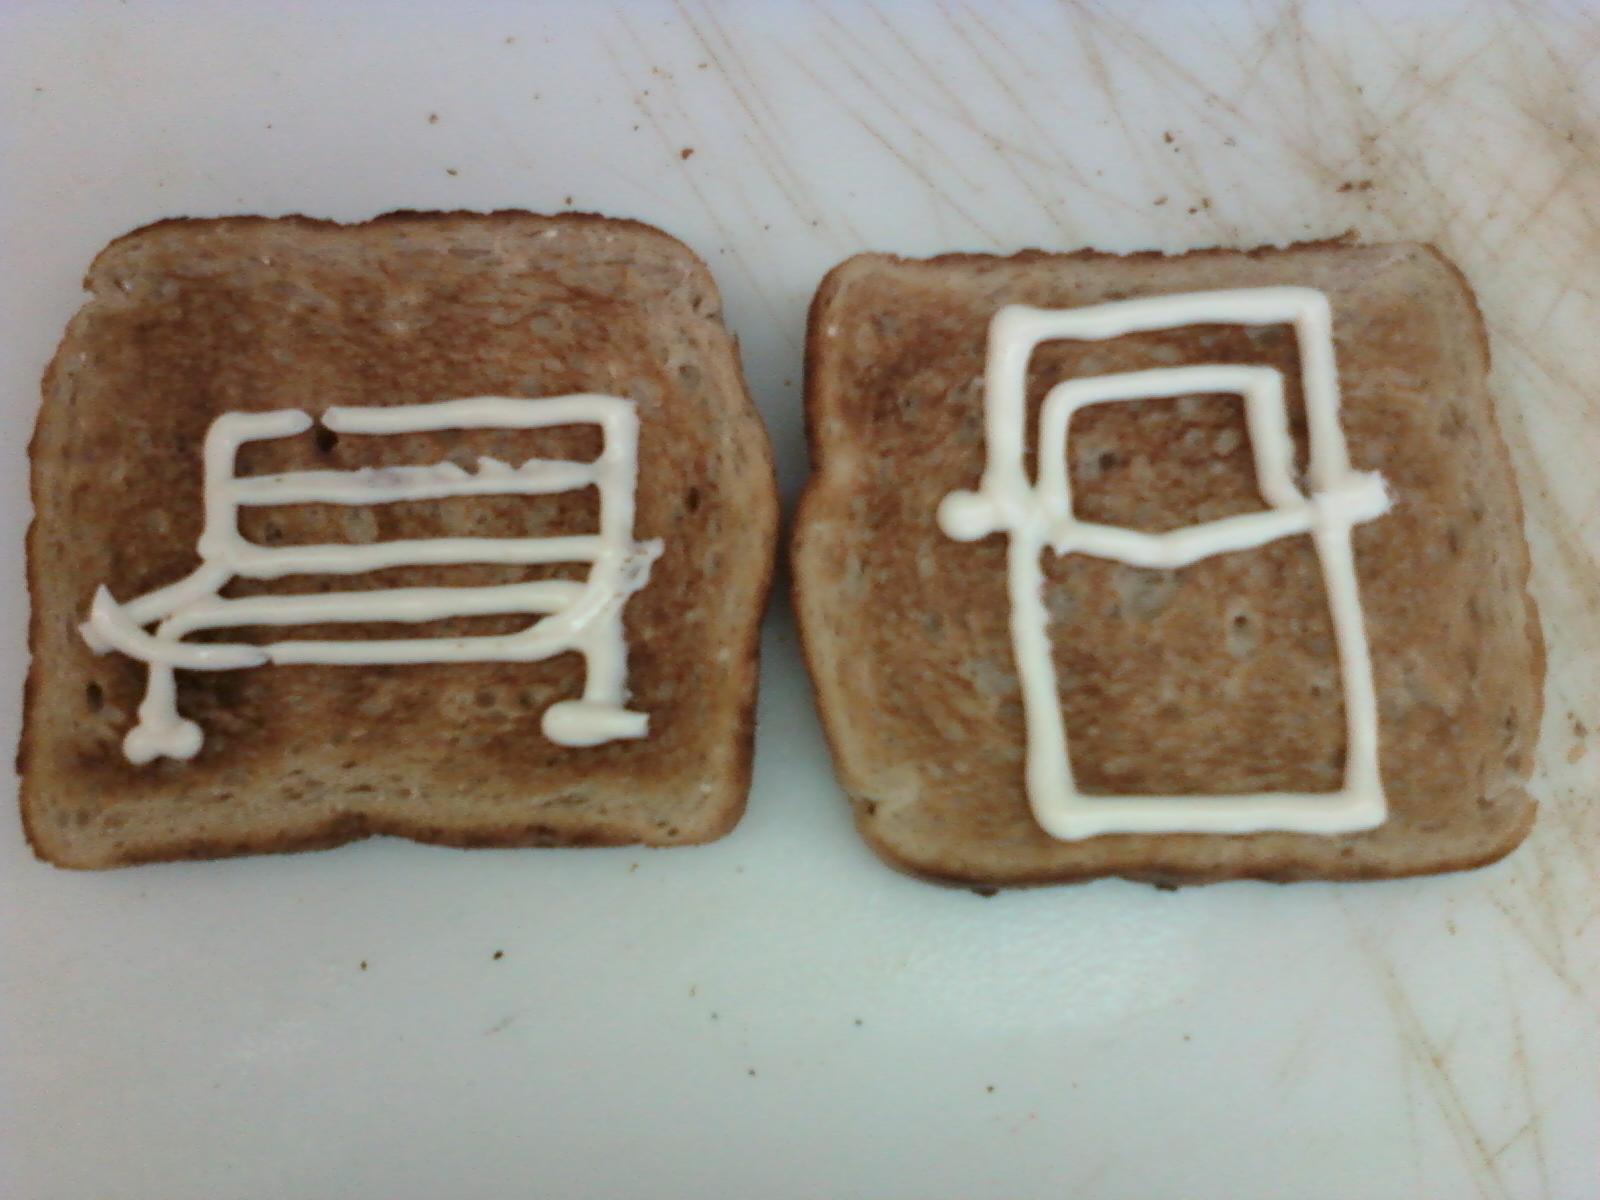 sandwich_art/0802110920.jpg